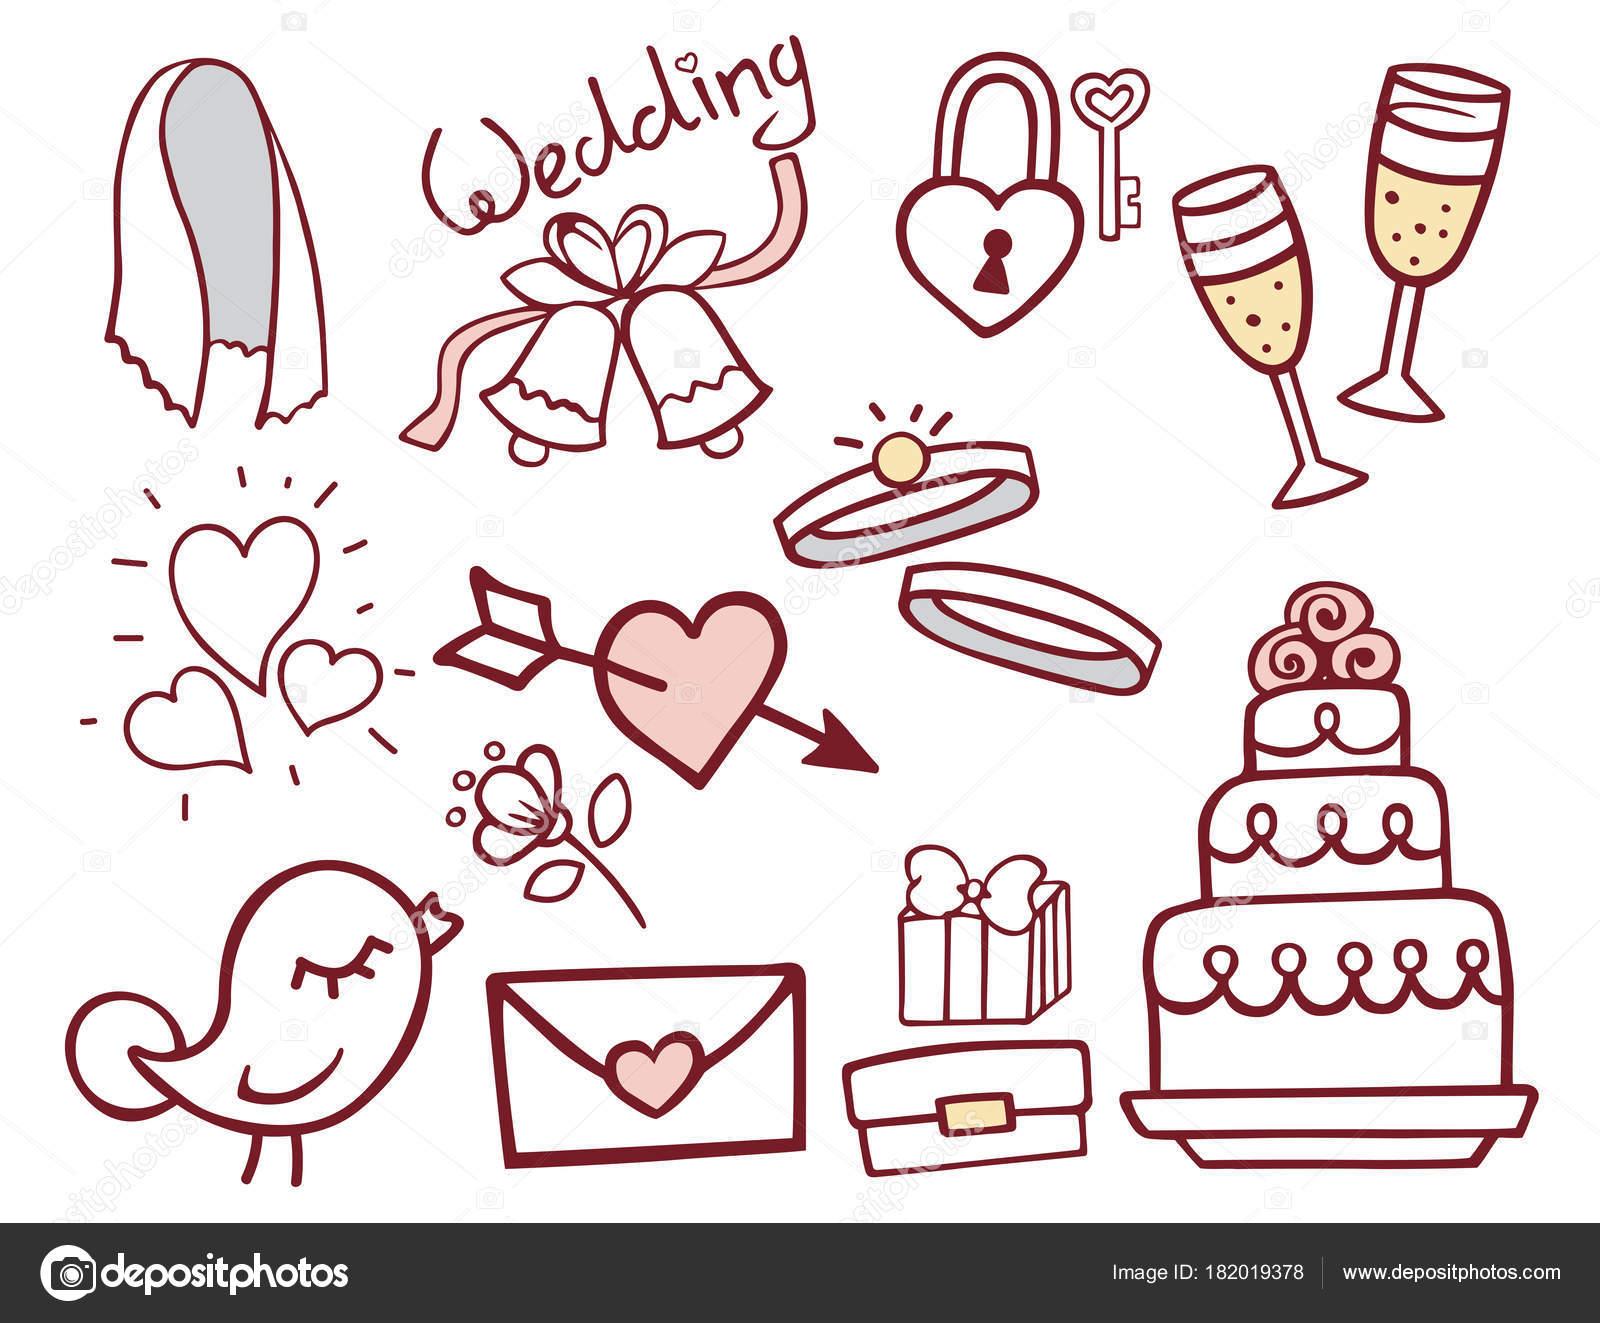 Wedding outline hand drawn icons vector illustration married wedding outline hand drawn icons vector illustration married celebration music groom invitation elements stock stopboris Gallery